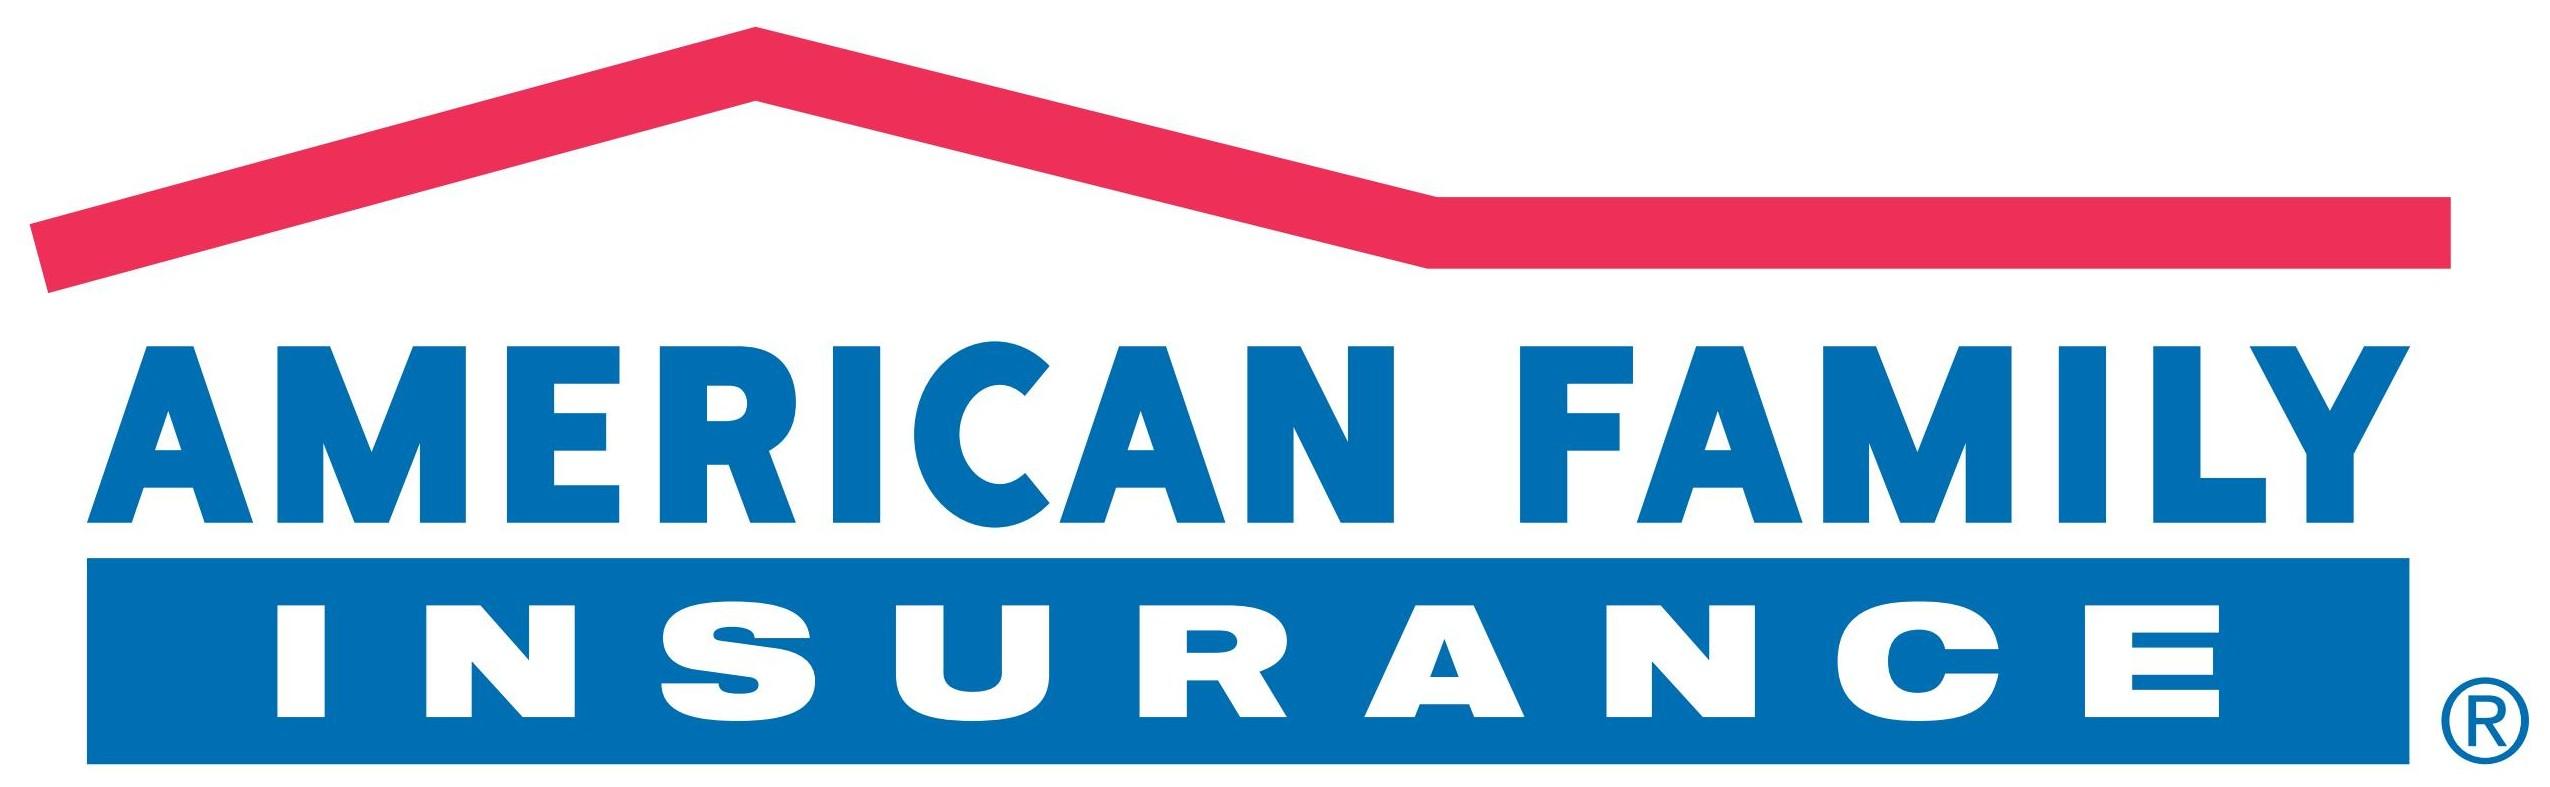 American Family Insurance Logo photo - 1